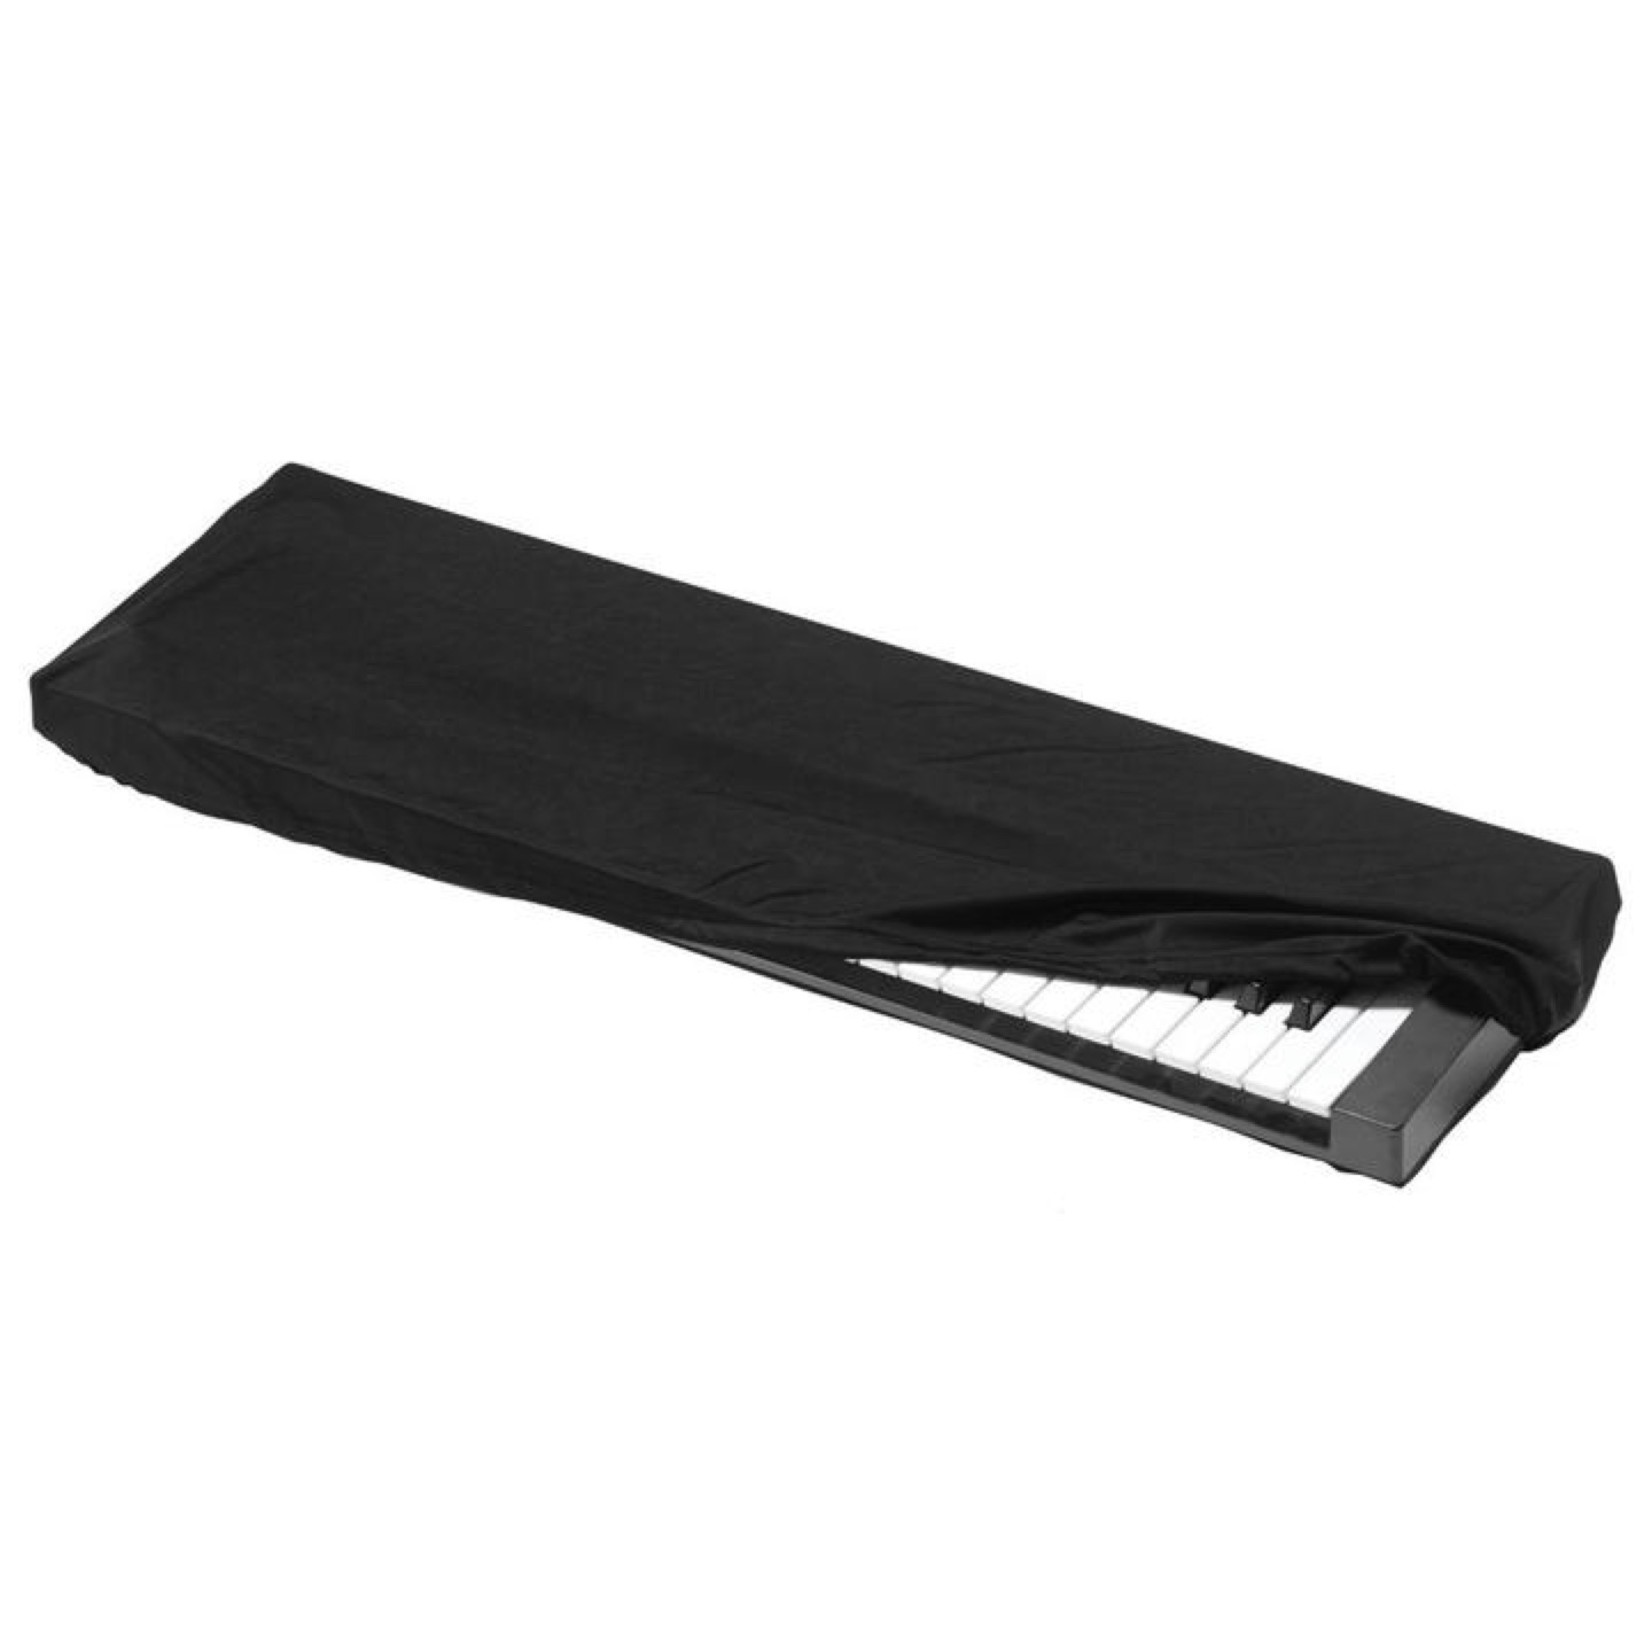 Kaces Kaces KKC-MD Stretchy Keyboard Dust Cover - Medium Black (for 61- and 76-key keyboards)